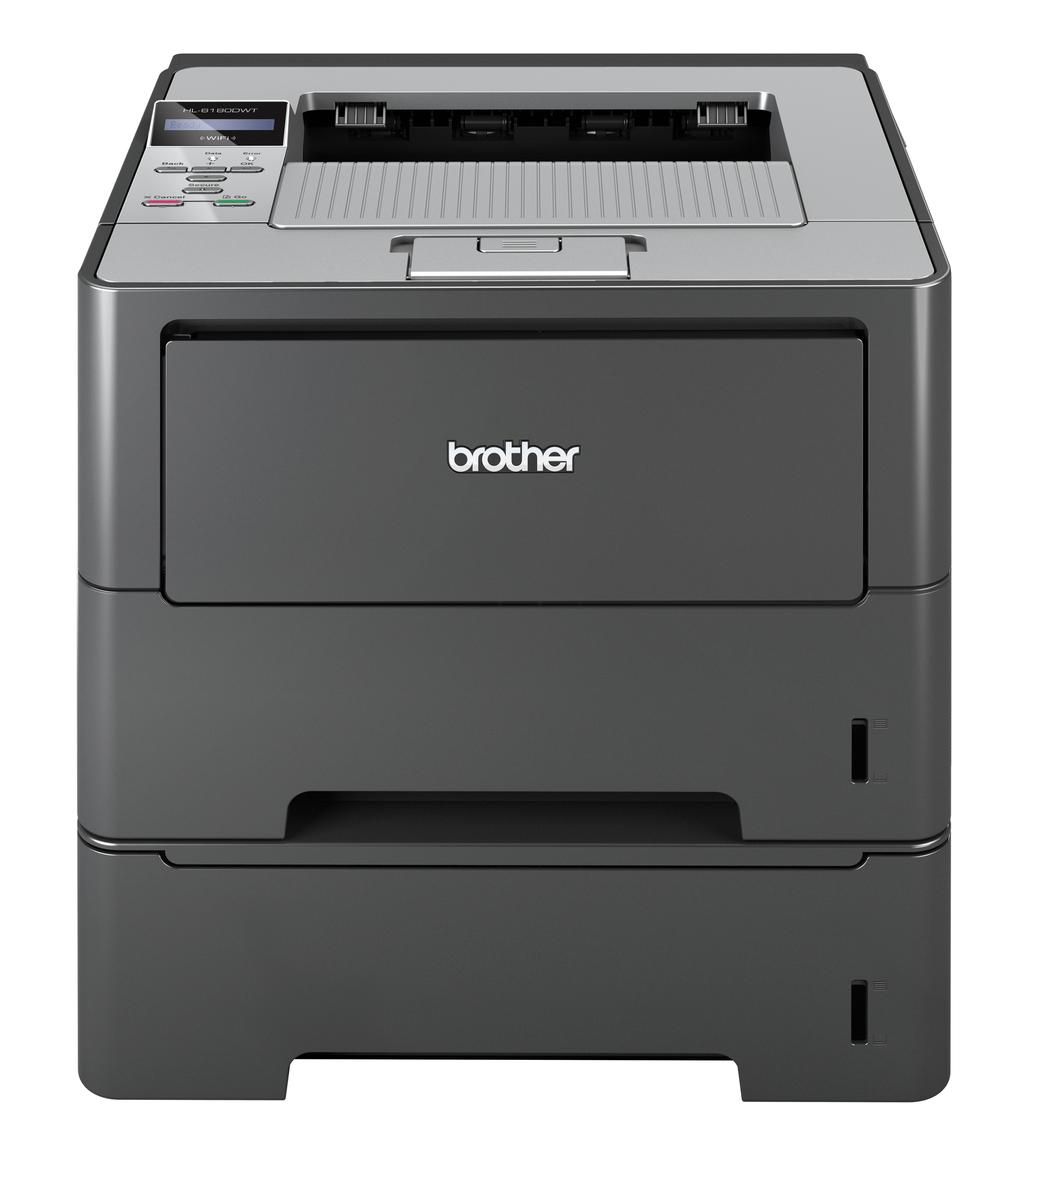 Принтер Brother HL-6180DWT